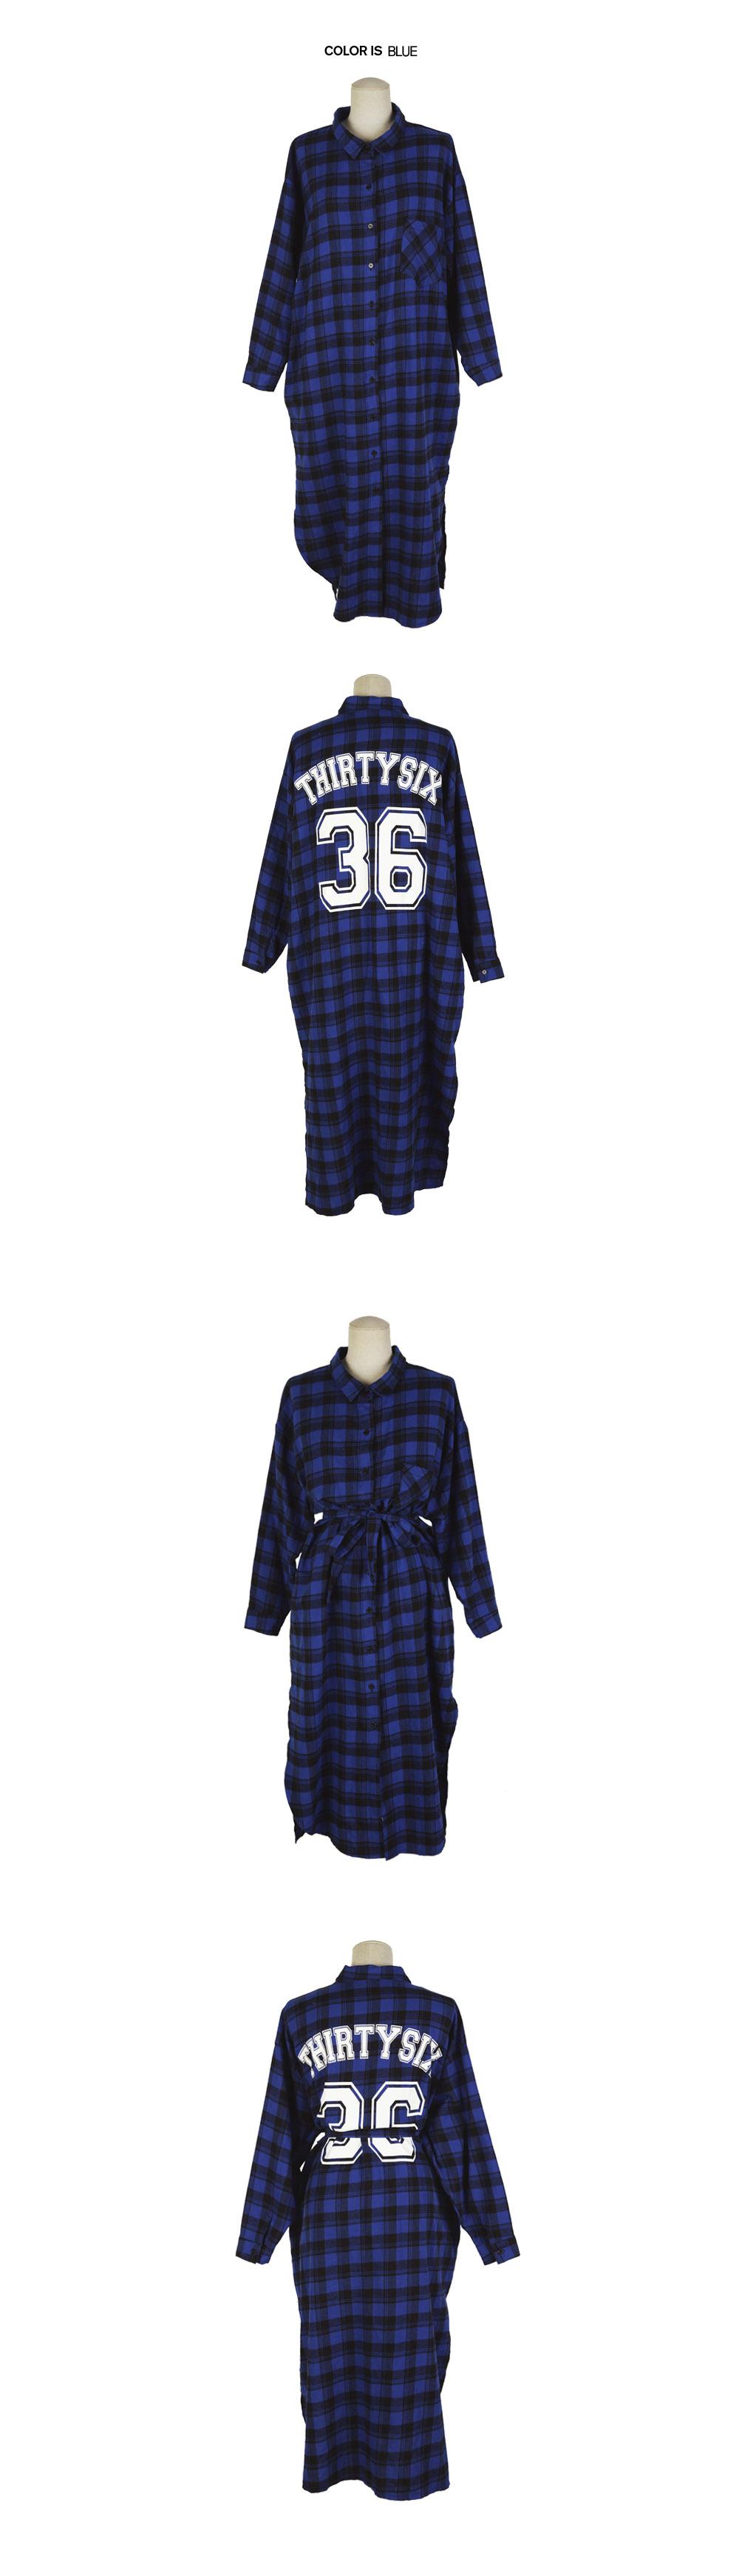 Long Checkered Shirt with 36 Print Back